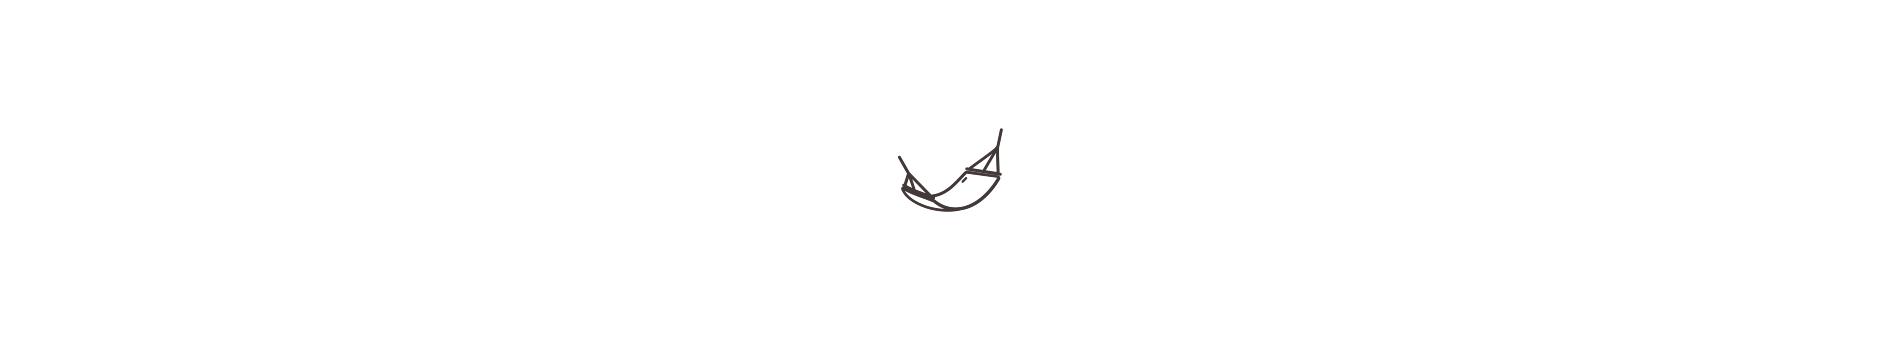 Fauteuil - hamac